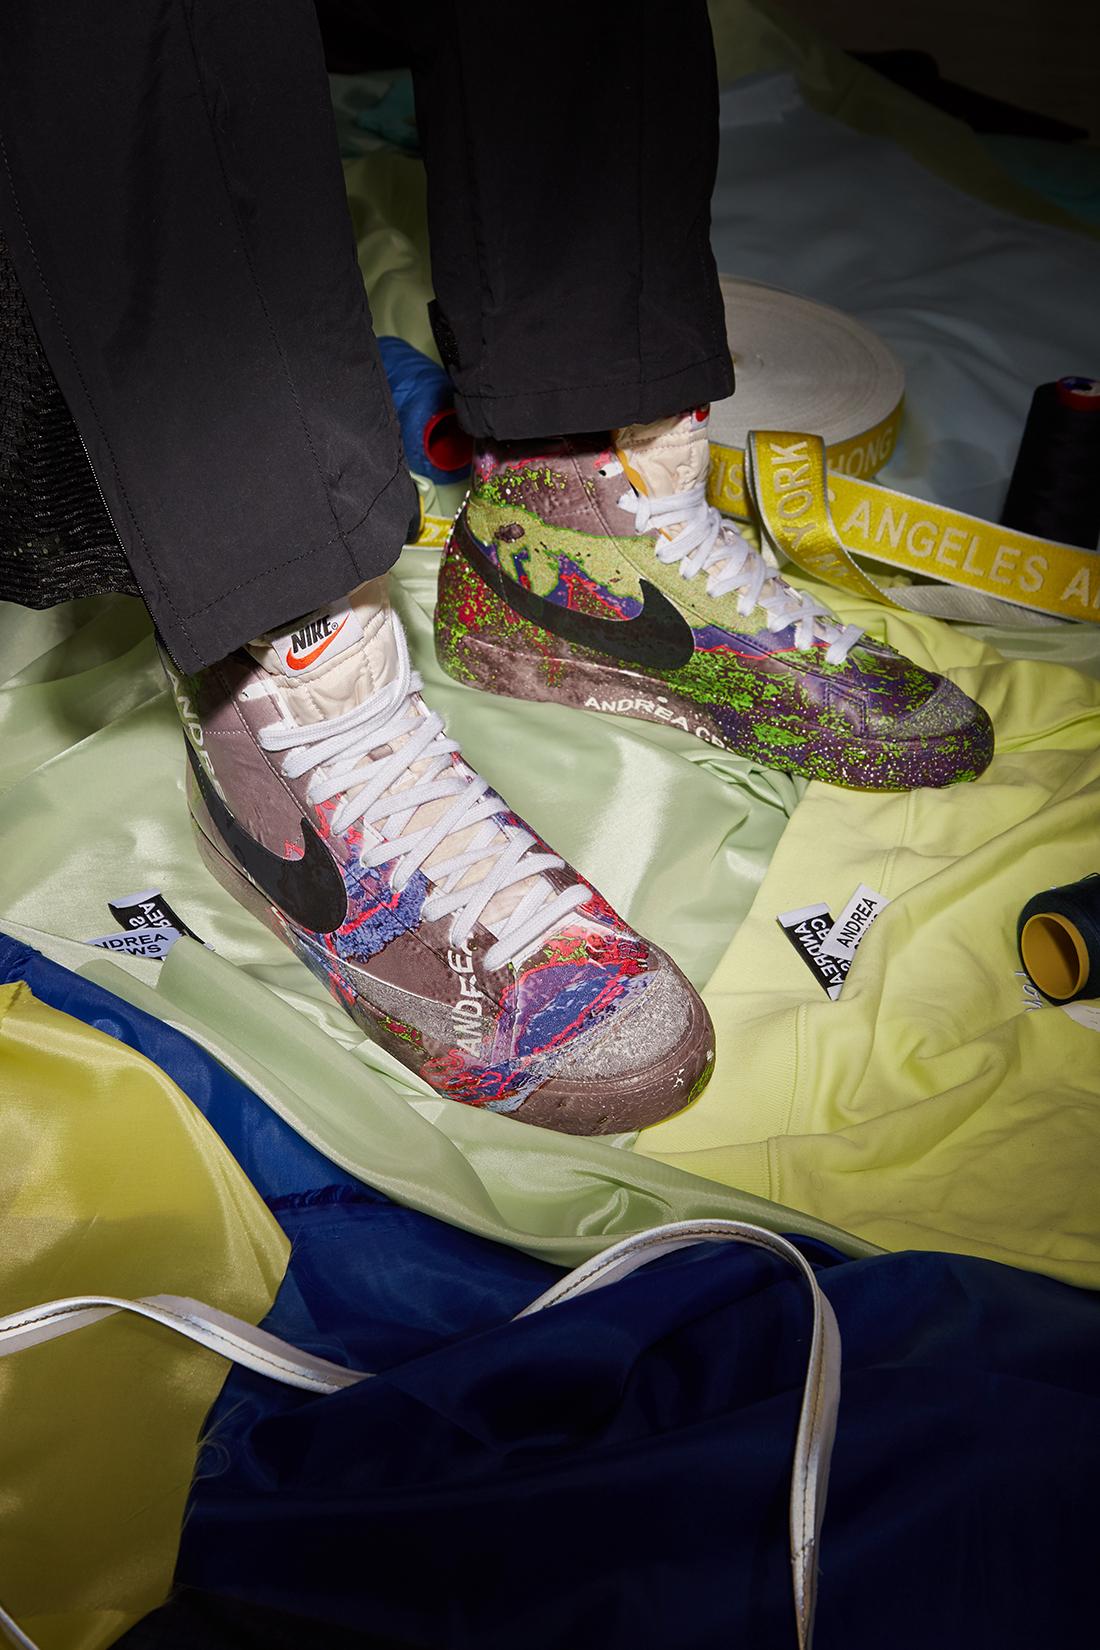 Courir 40 ans x Nike Blazer x Andrea Crews